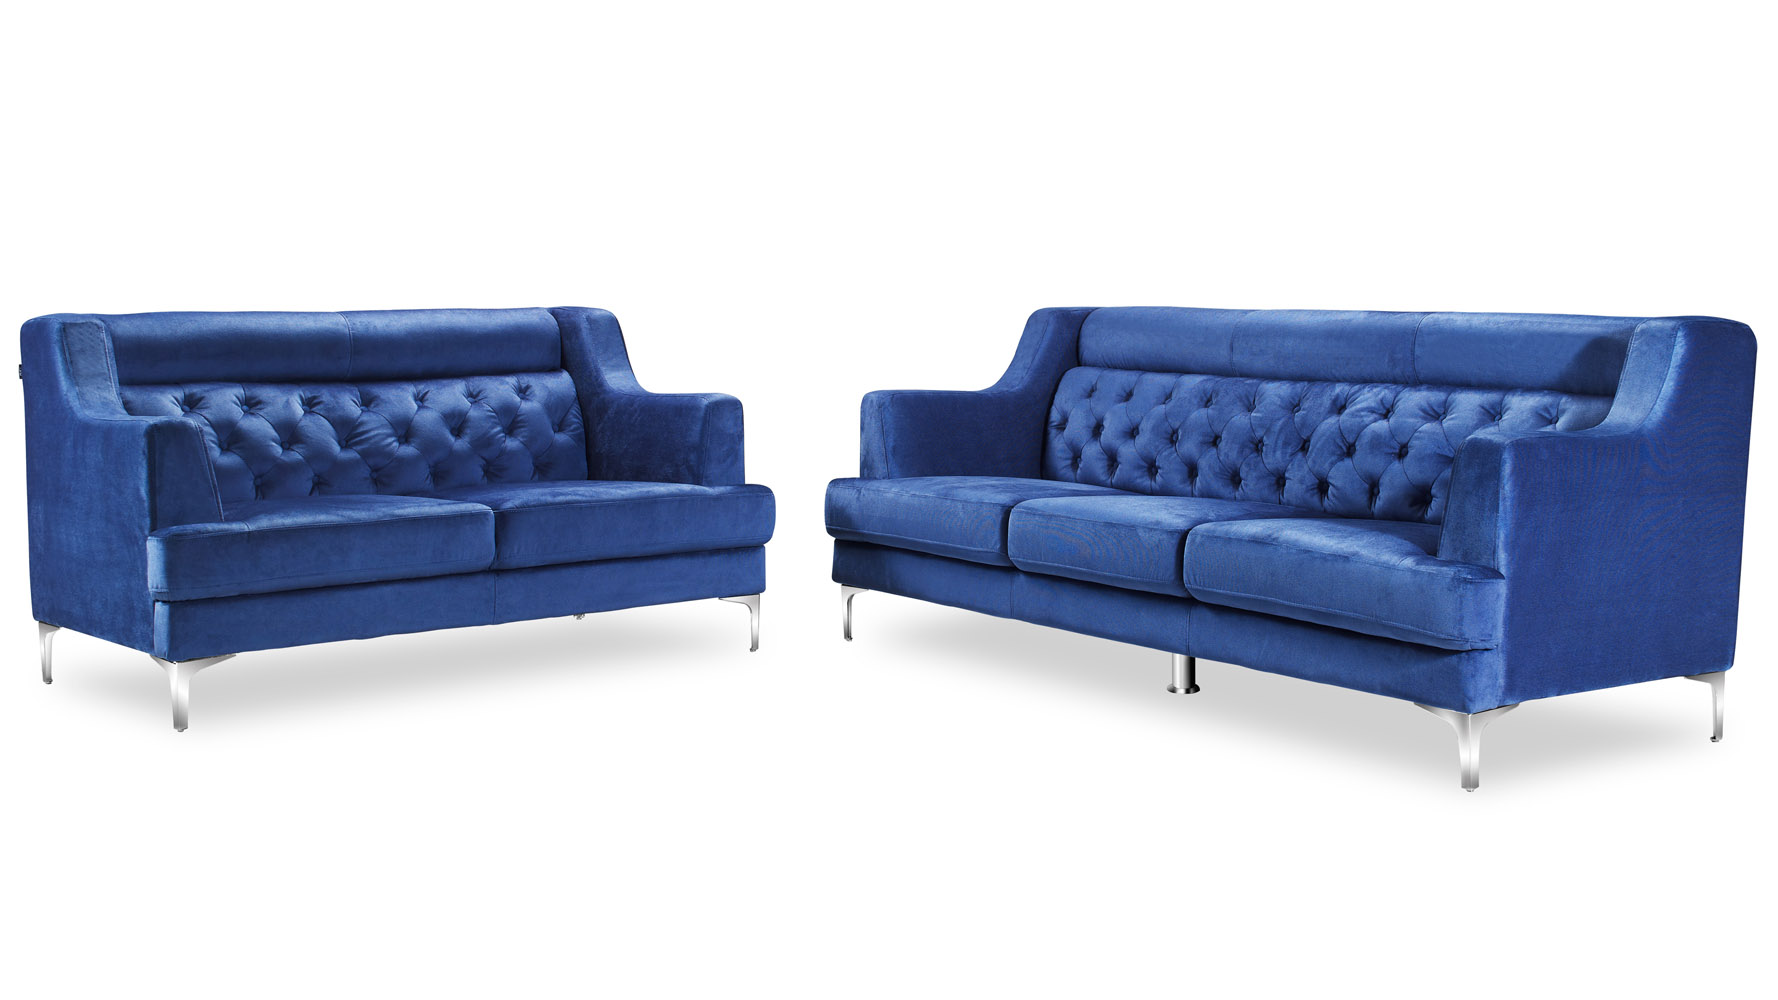 print sofa set mainstays sleeper with memory foam mattress zara fabric tufted chrome legs navy blue